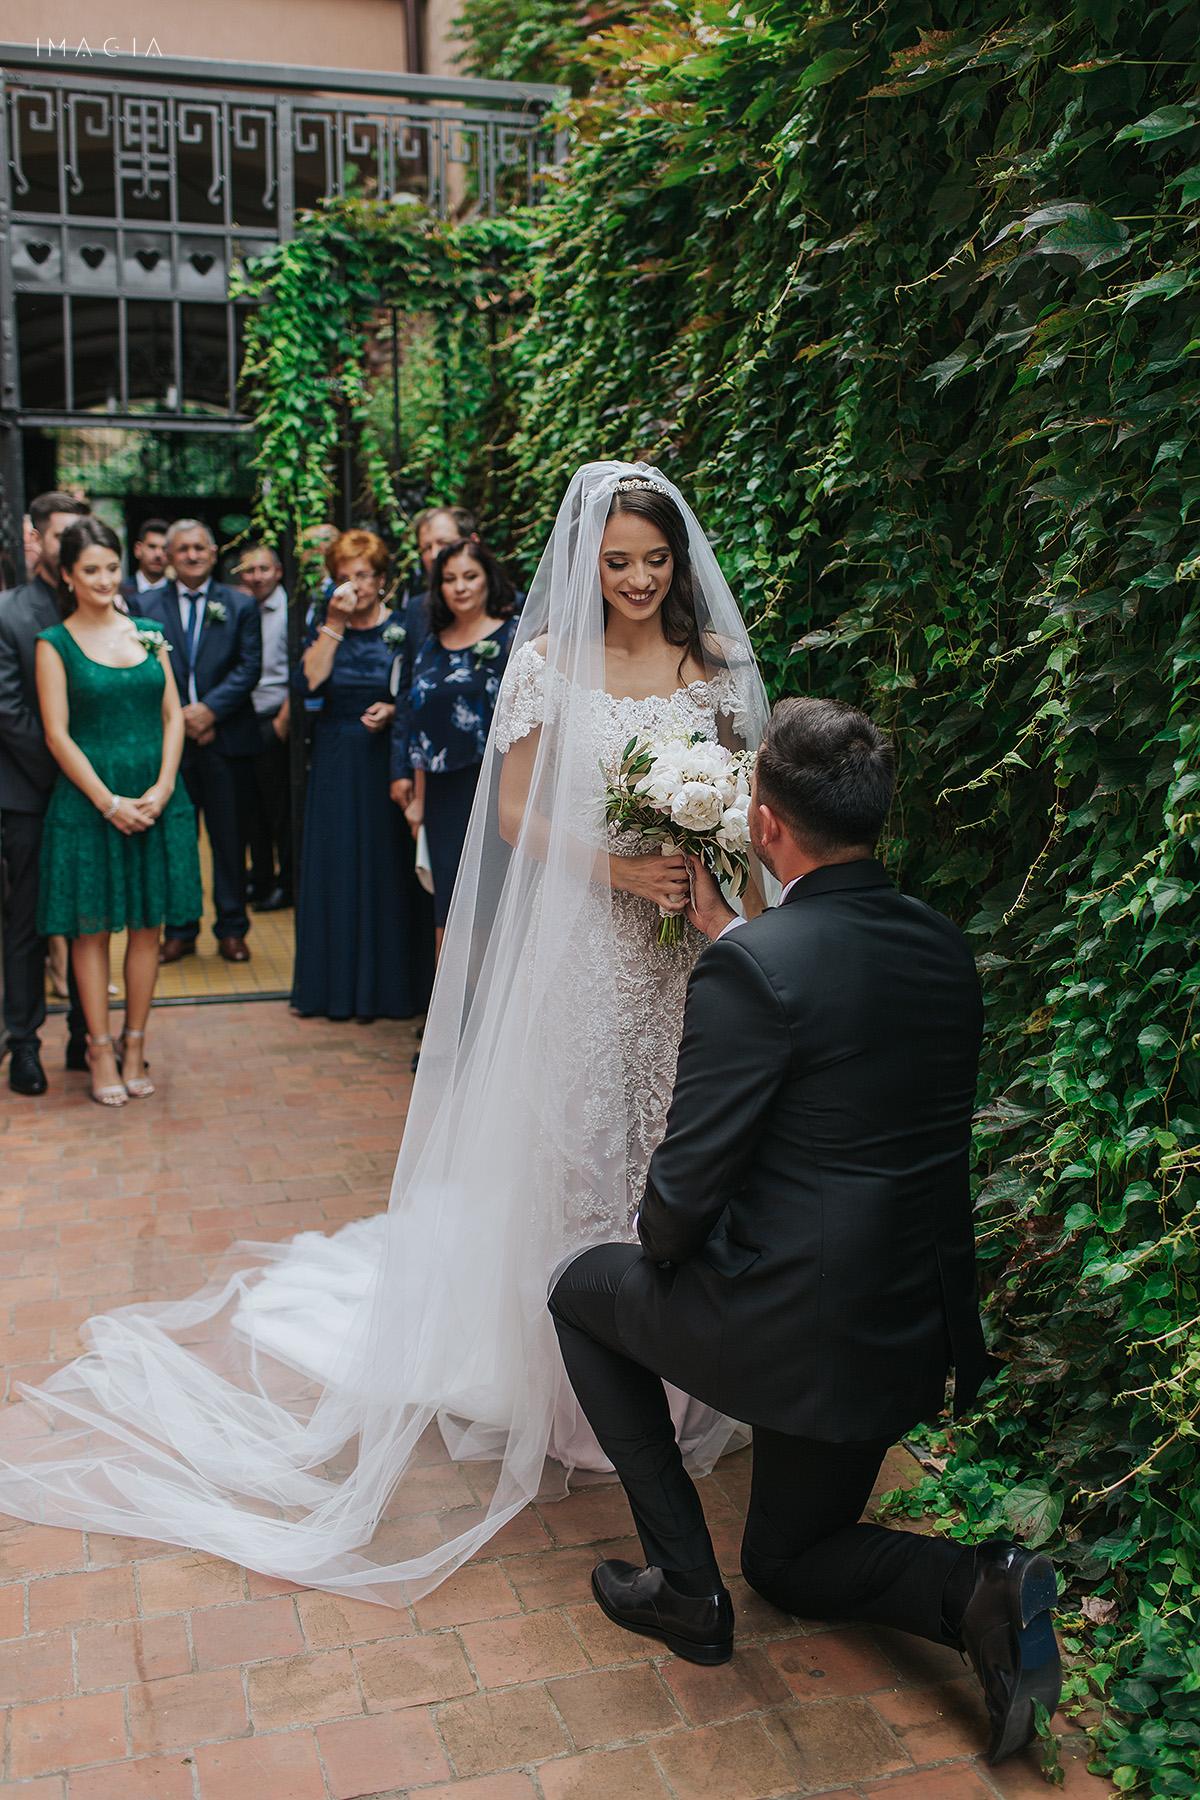 Fotografii de nunta in Satu Mare cu rochie creata de Ioana Calin la Hotel Poesis